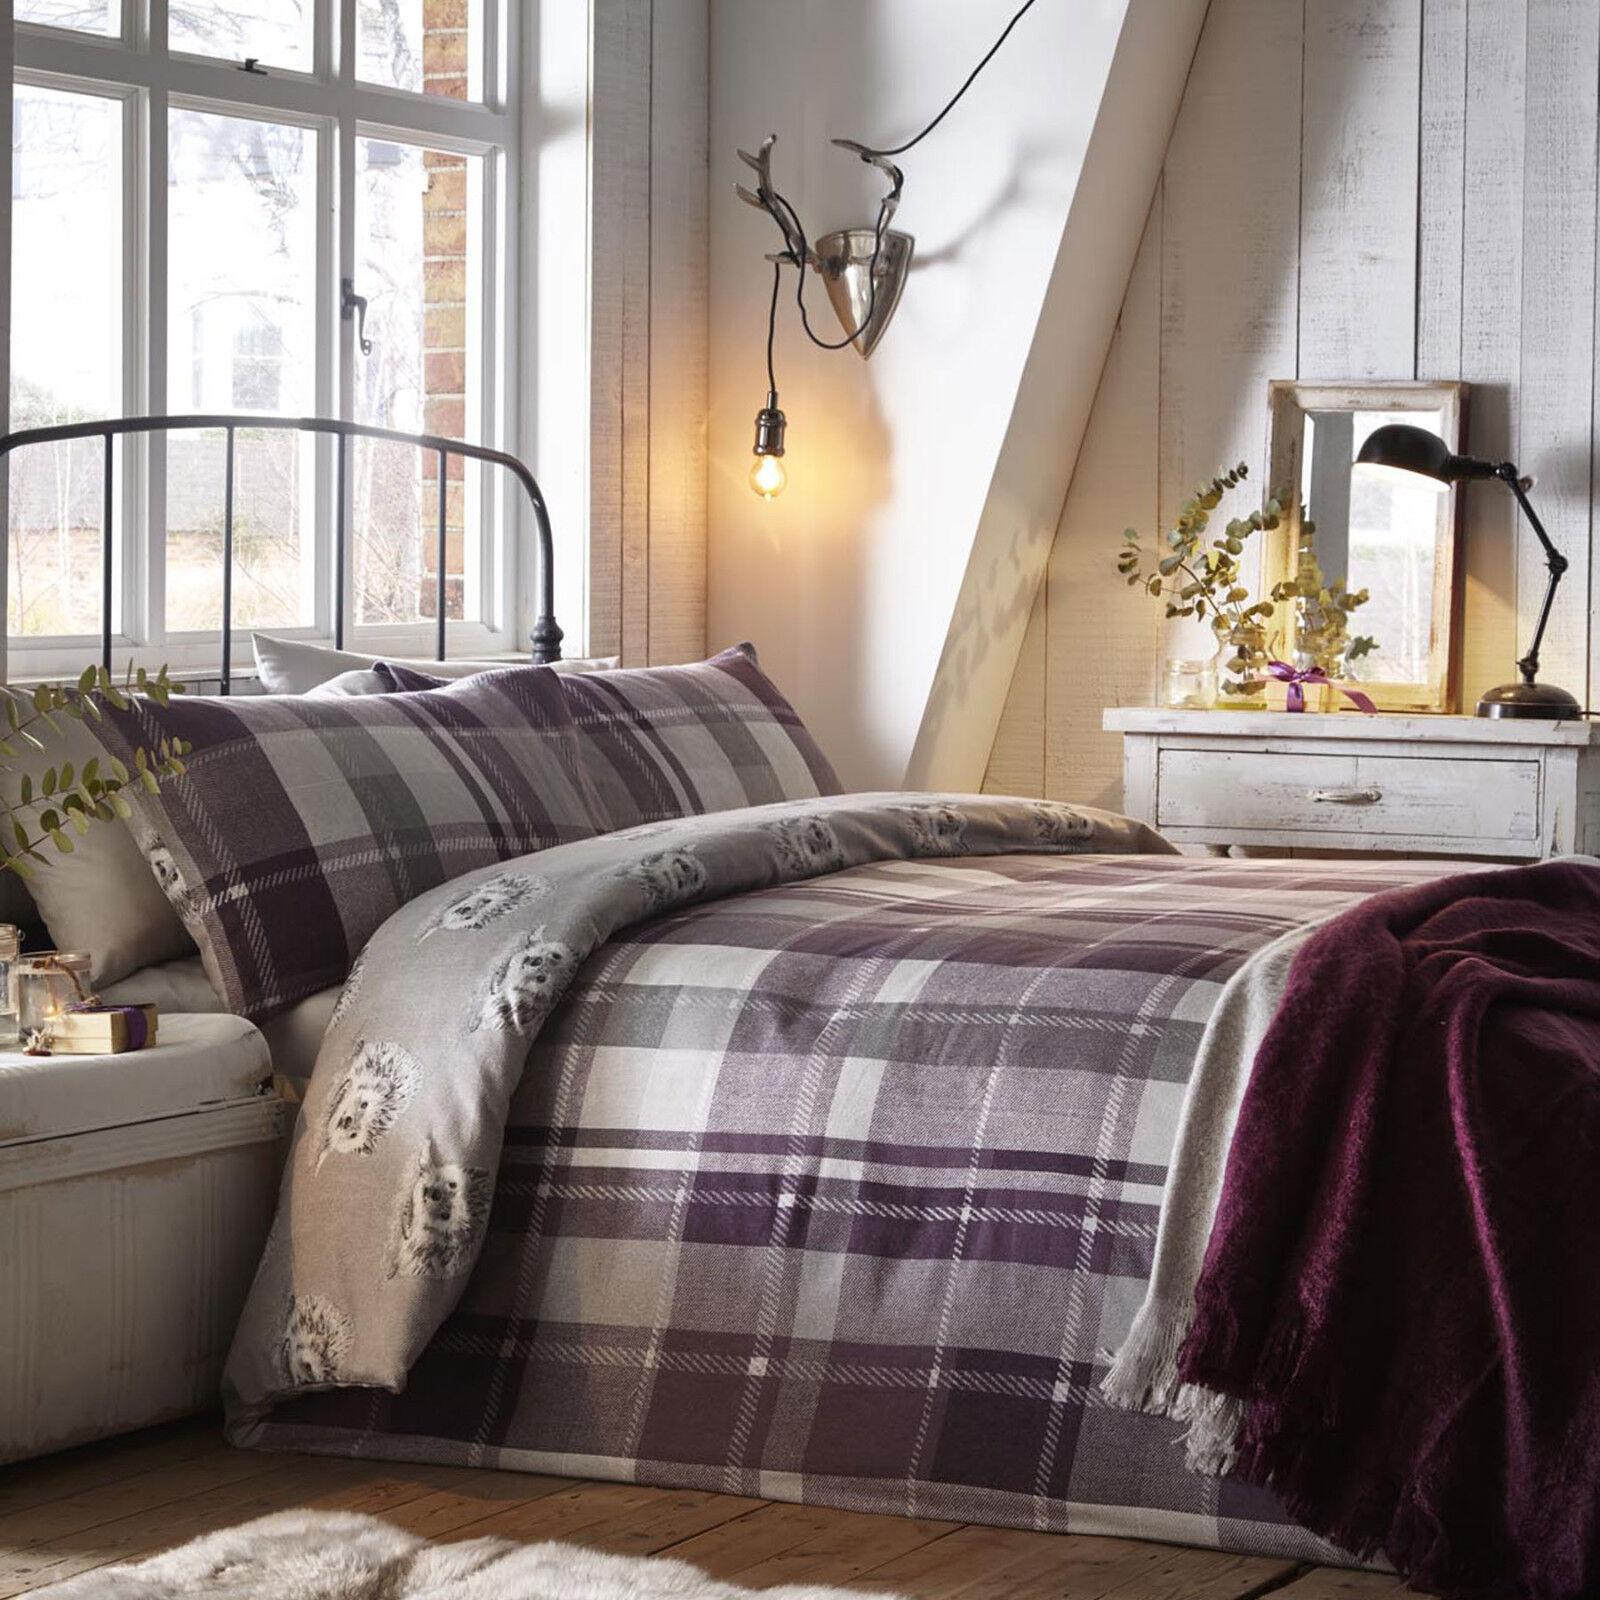 Asda Reversible Double Duvet Cover Set 2 Sheets 4 Pillowcases Purple Cotton For Sale Ebay